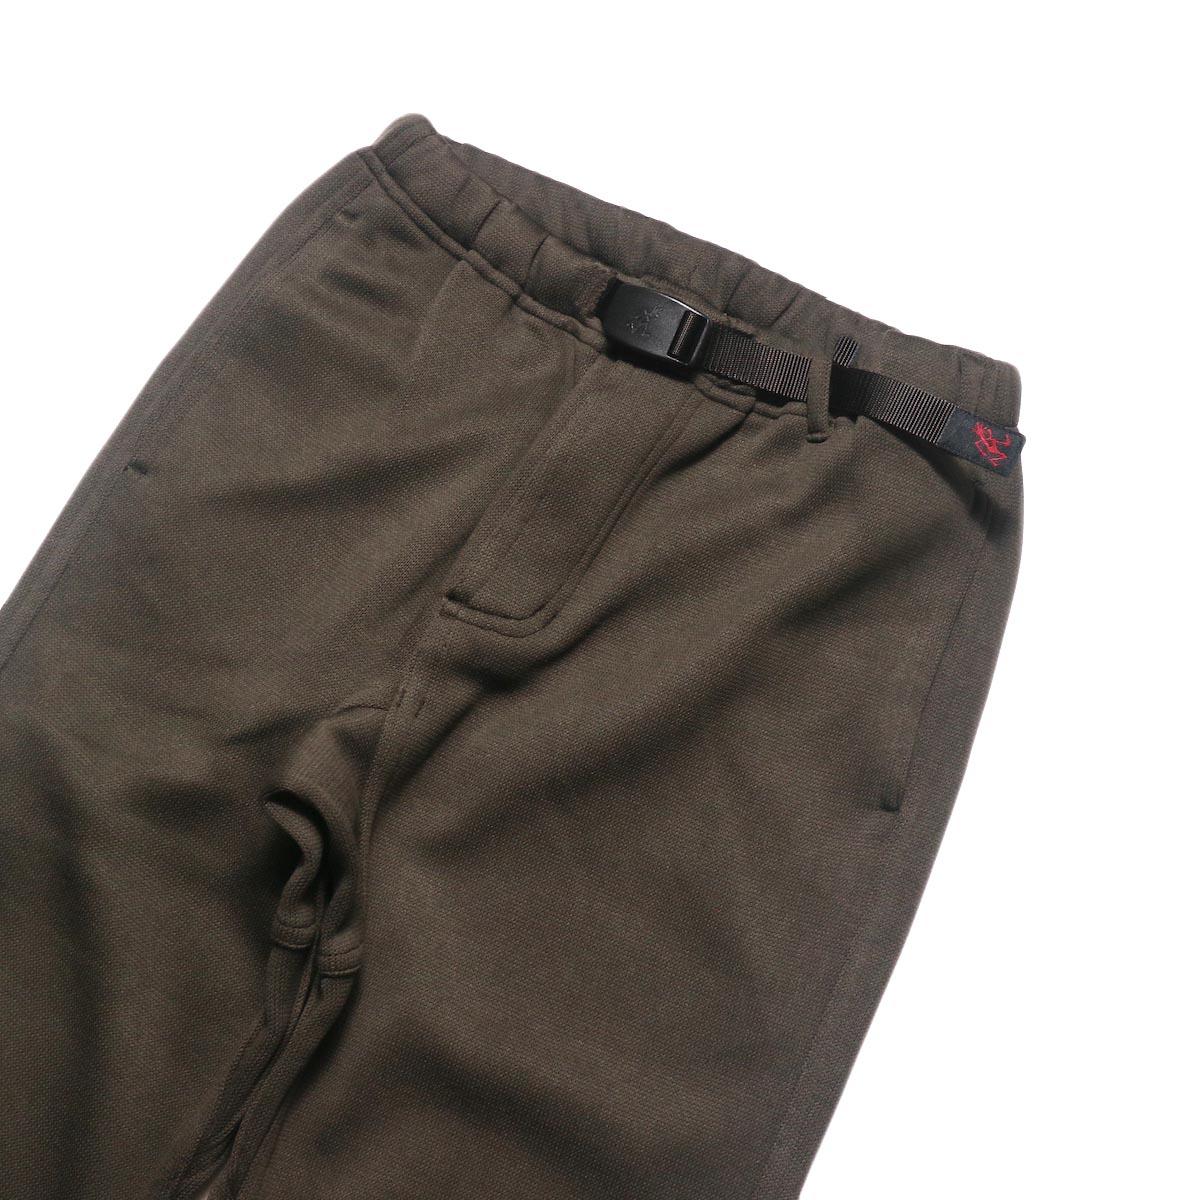 GRAMICCI / BONDING KNIT FLEECE NN-PANTS JUST CUT (Dark Brown)ウエスト